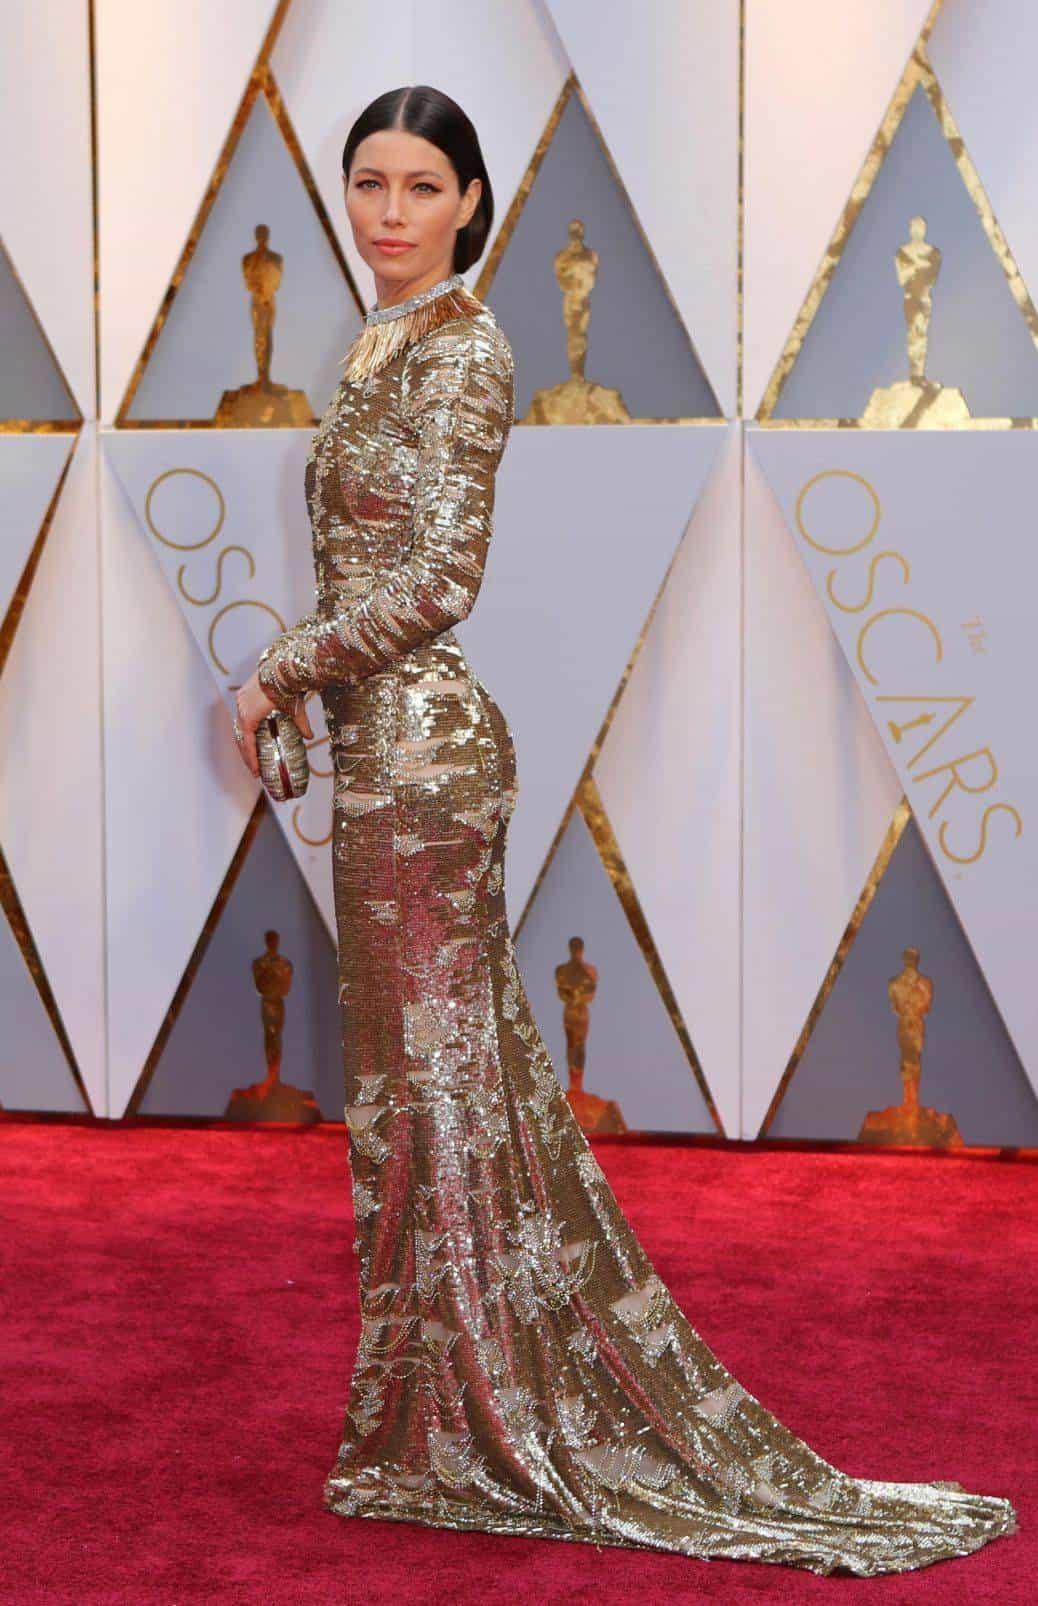 89th Academy Awards - Oscars Red Carpet Arrivals - Hollywood, California, U.S. - 26/02/17 - Actress Jessica Biel. REUTERS/Mike Blake